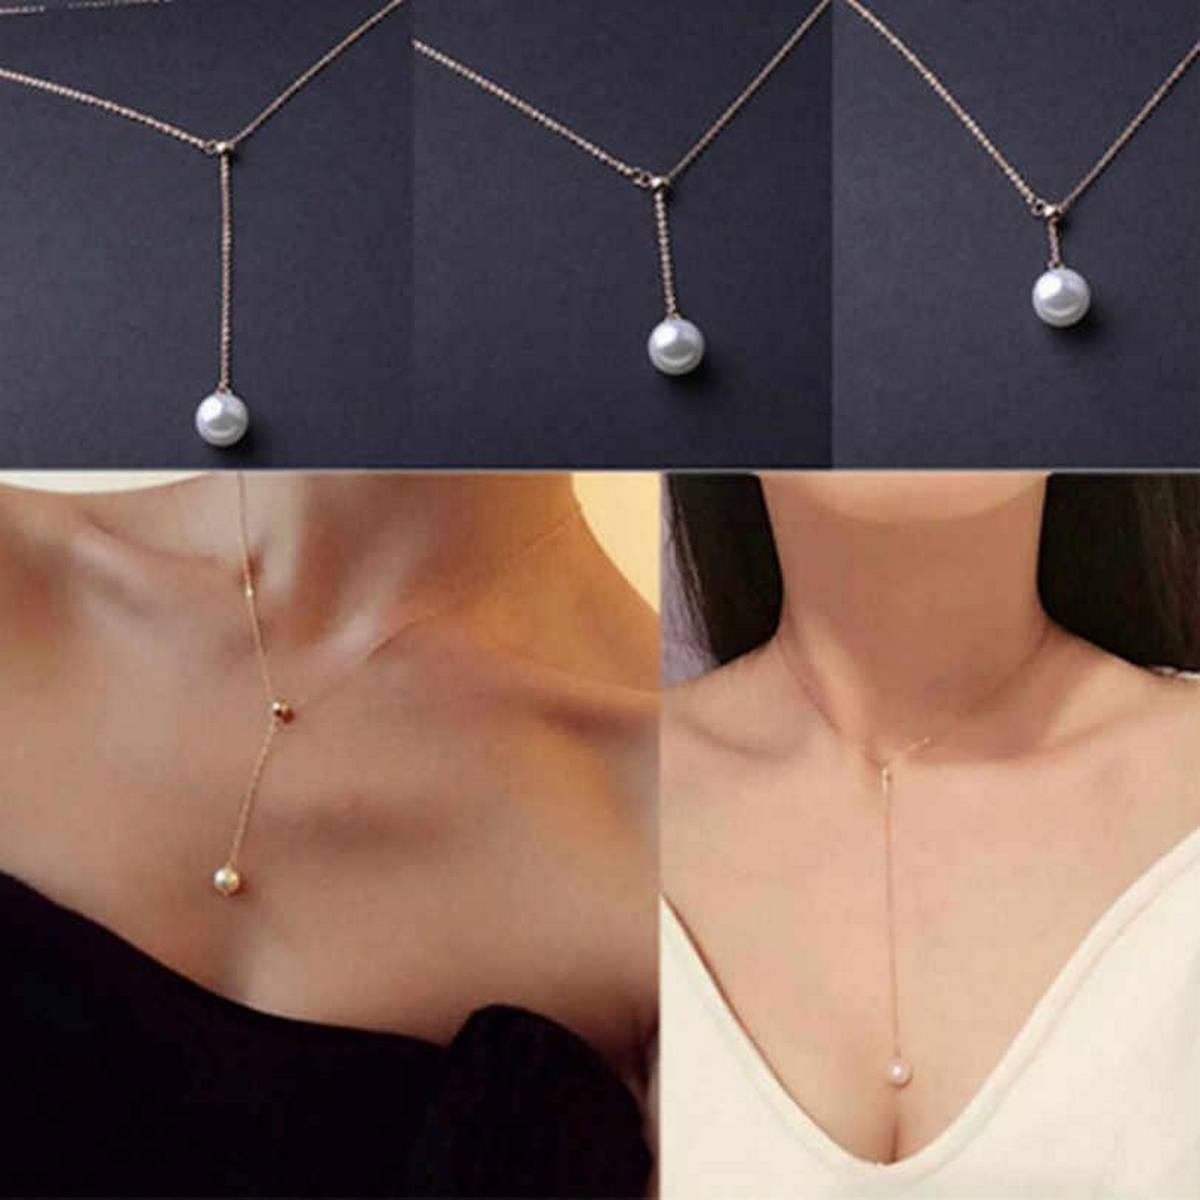 Darojay Womens Necklace Pearl Chain Choker Beaded Silver Pendant Girls Long Gift Jewelry